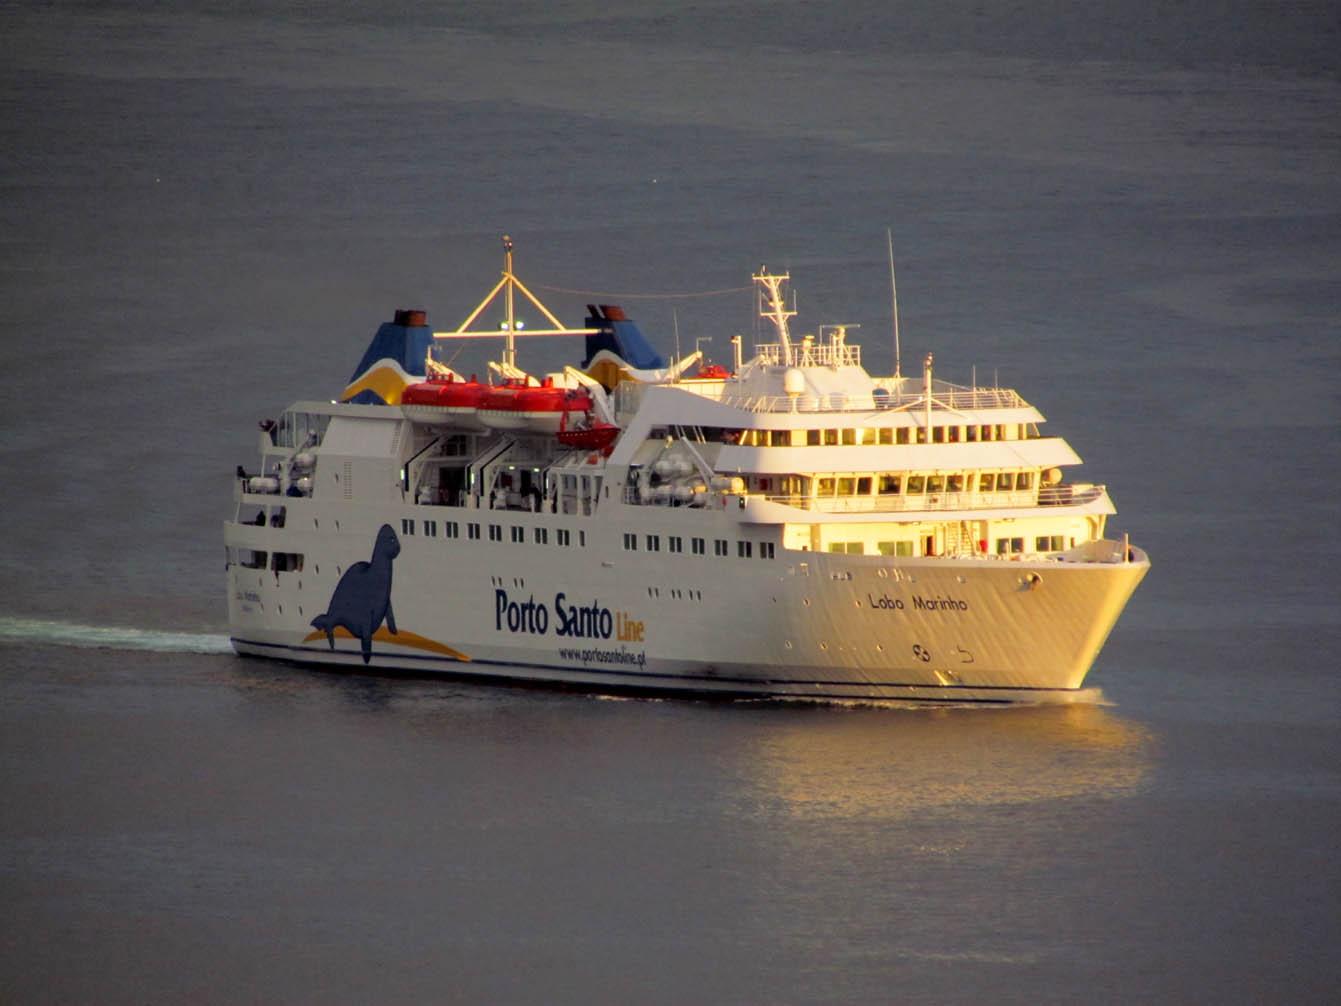 Beautiful light to receive the ferry Lobo Marinho